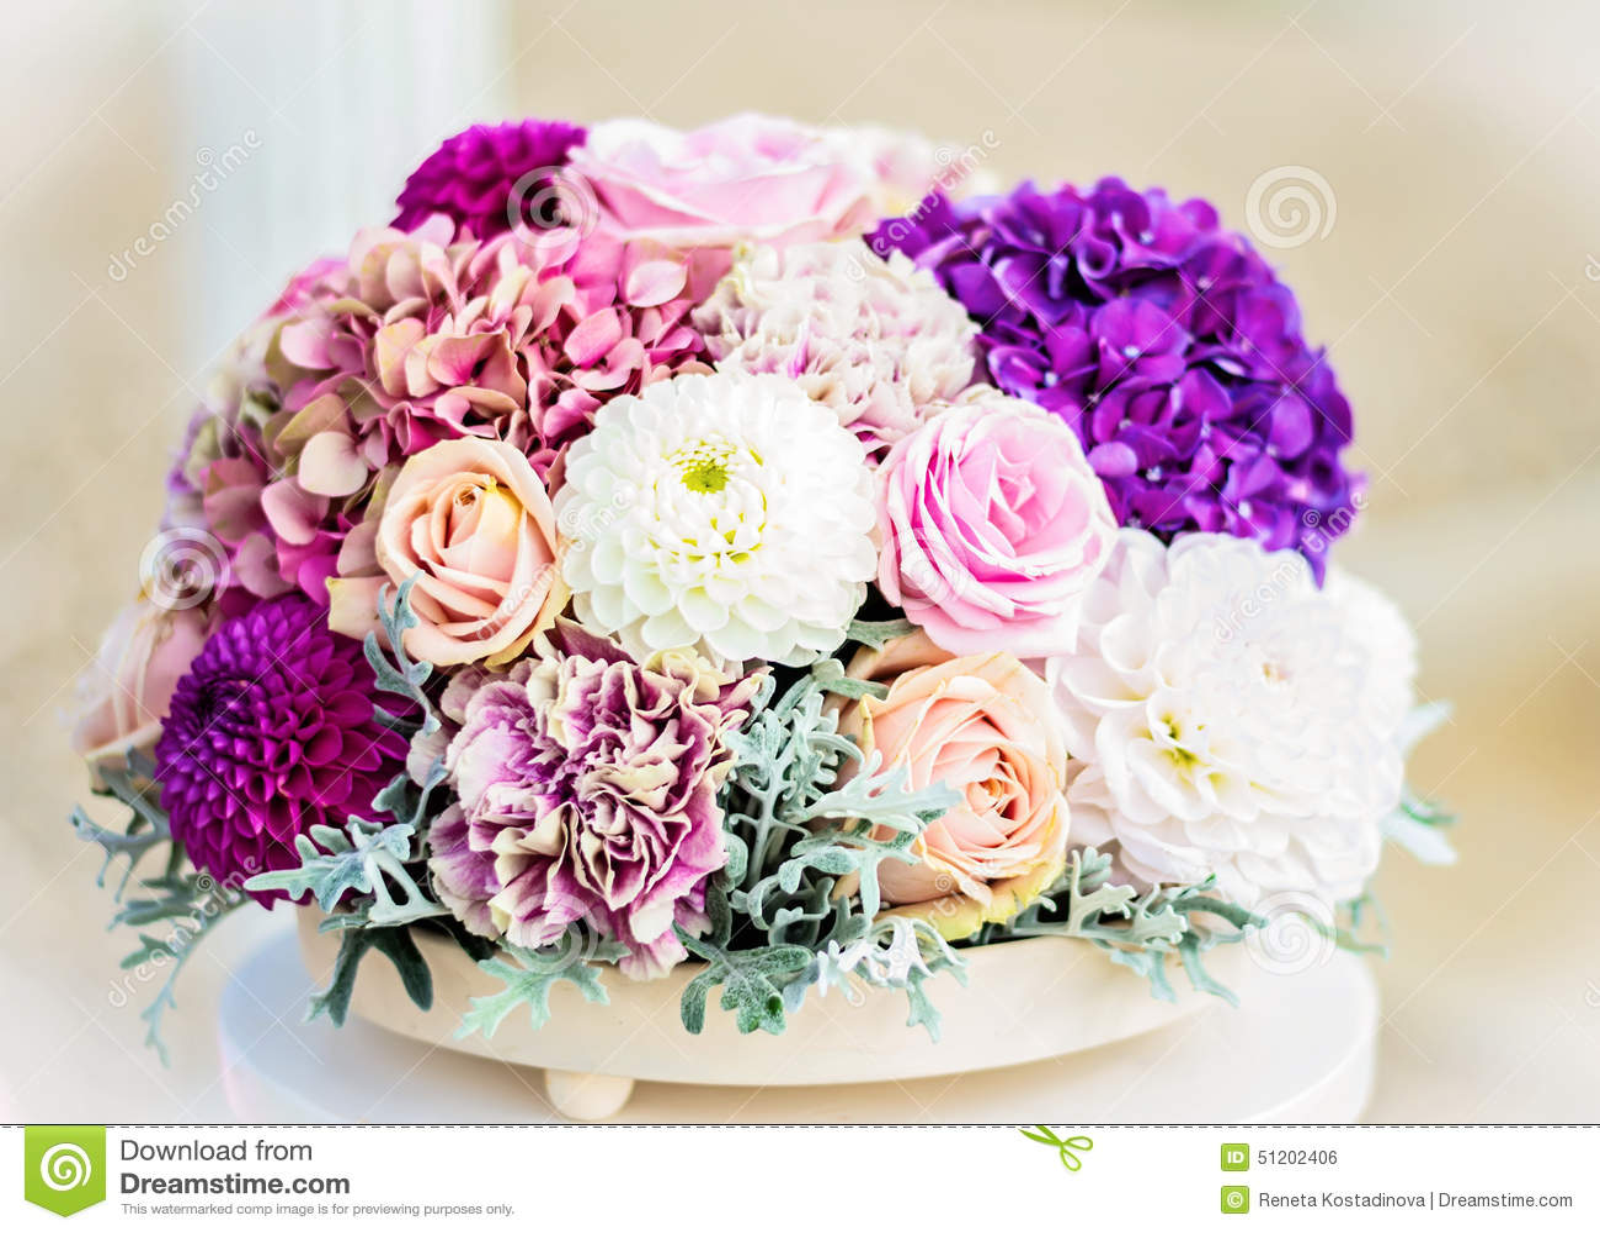 Flower arrangement in white and purple stock photo image of leaf flower arrangement in white and purple mightylinksfo Images